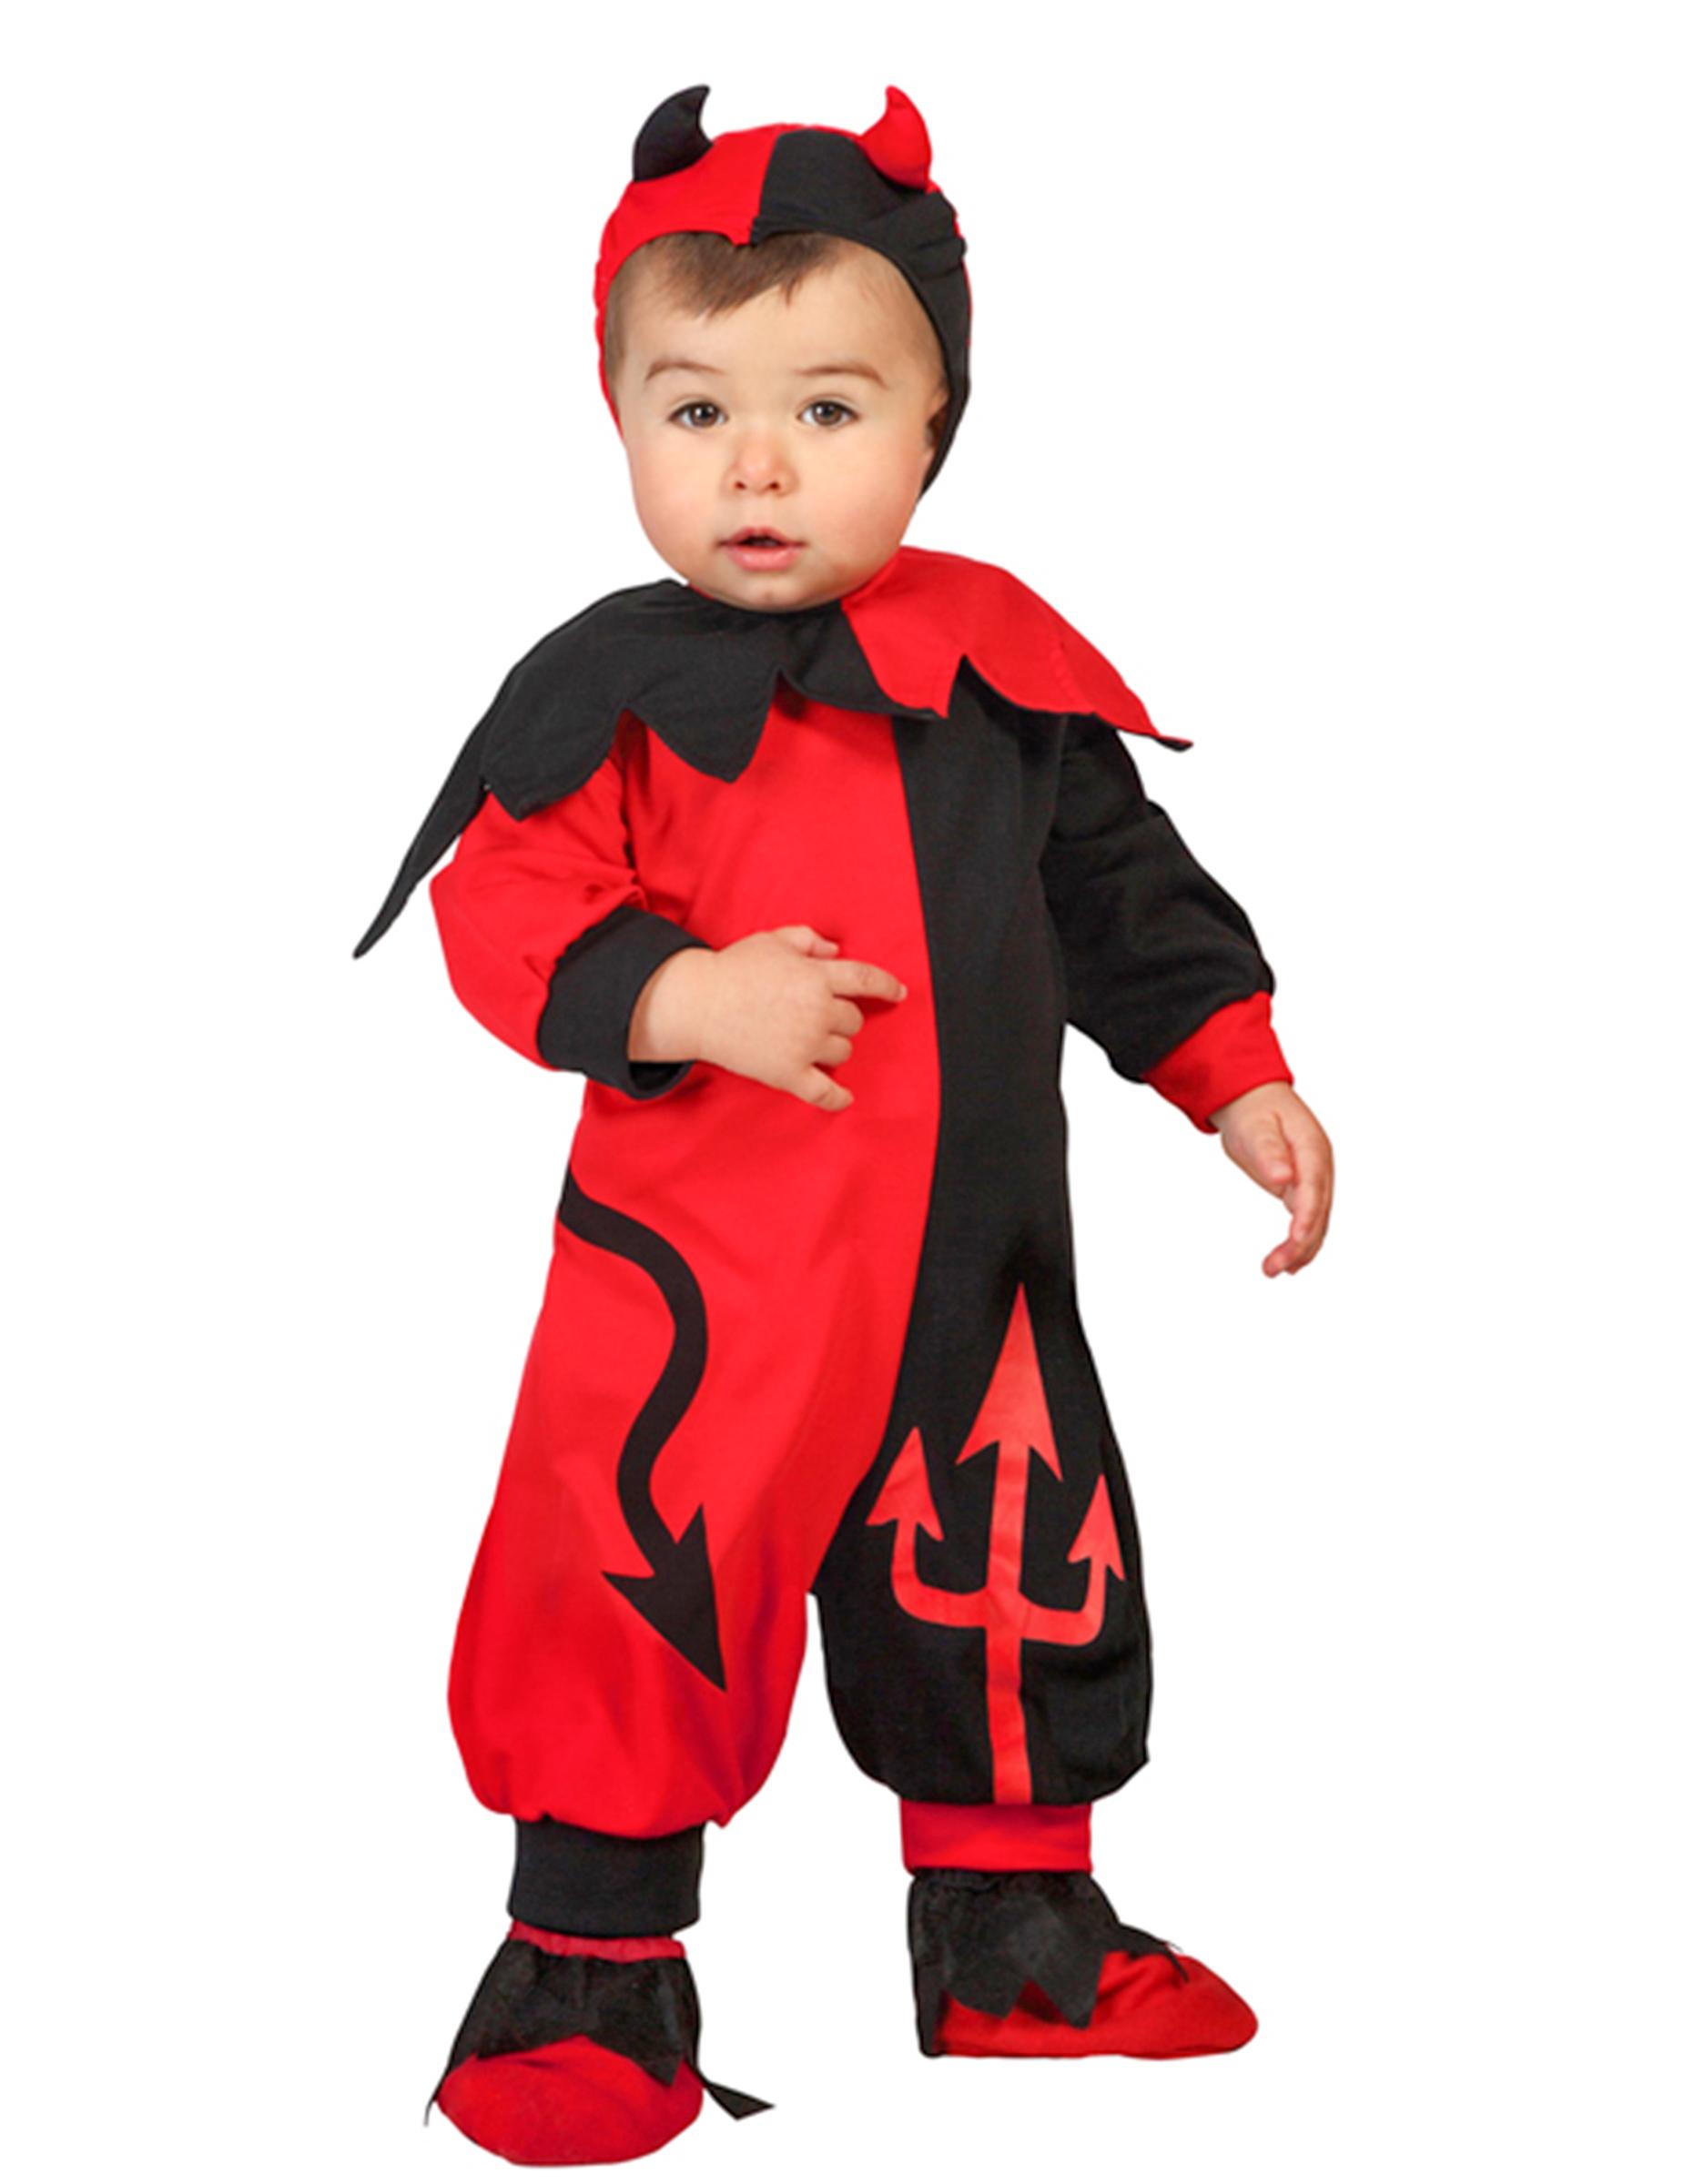 Costumi Halloween Neonati Vendita.Costume Diavoletto Di Halloween Neonato Costumi Bambini E Vestiti Di Carnevale Online Vegaoo